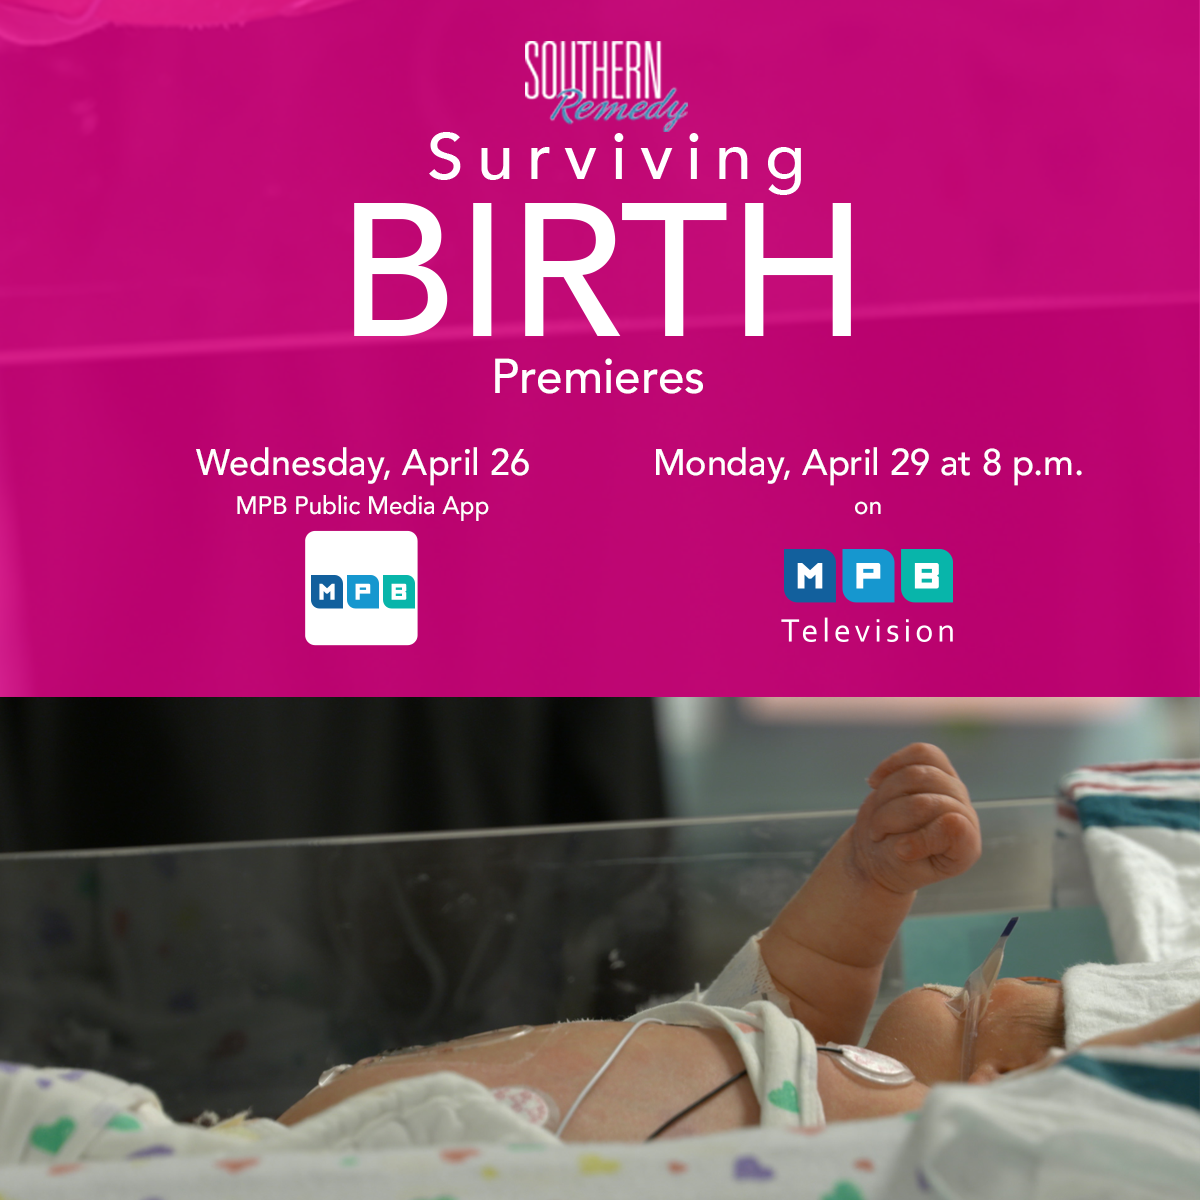 Southern Remedy: Surviving Birth